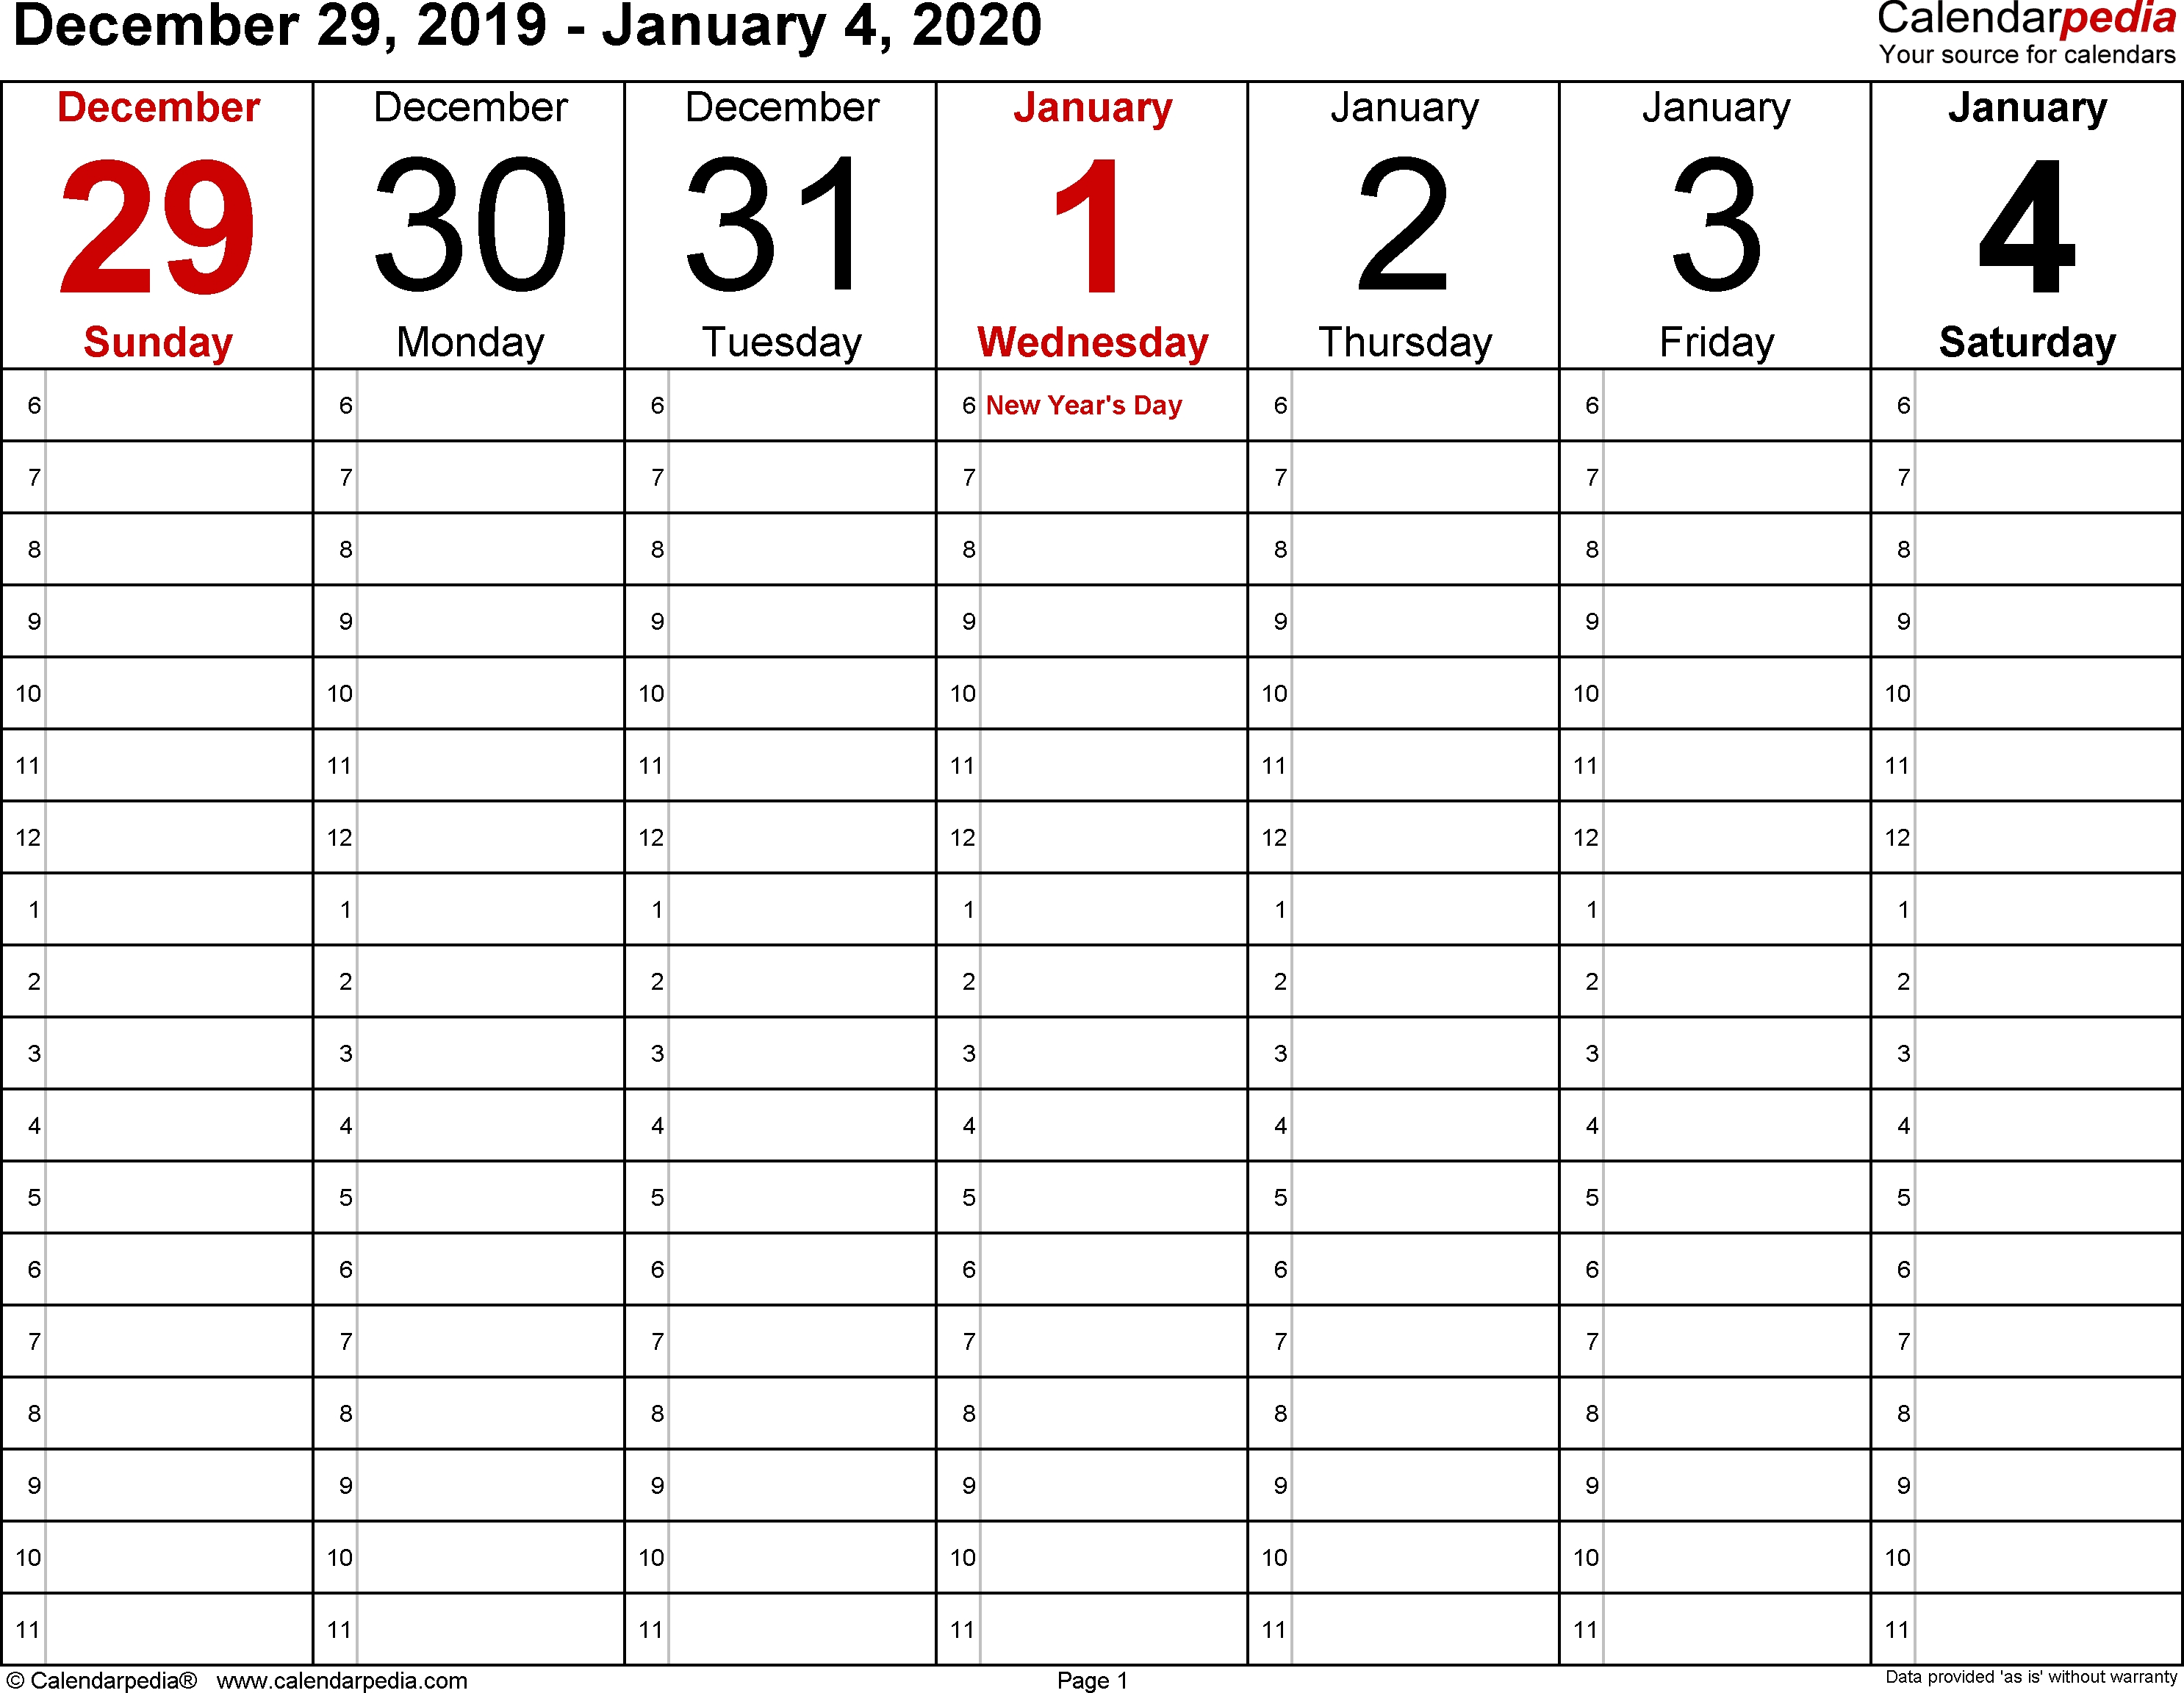 Weekly Calendar 2020 For Word - 12 Free Printable Templates in Calendar 365 2020 Printable